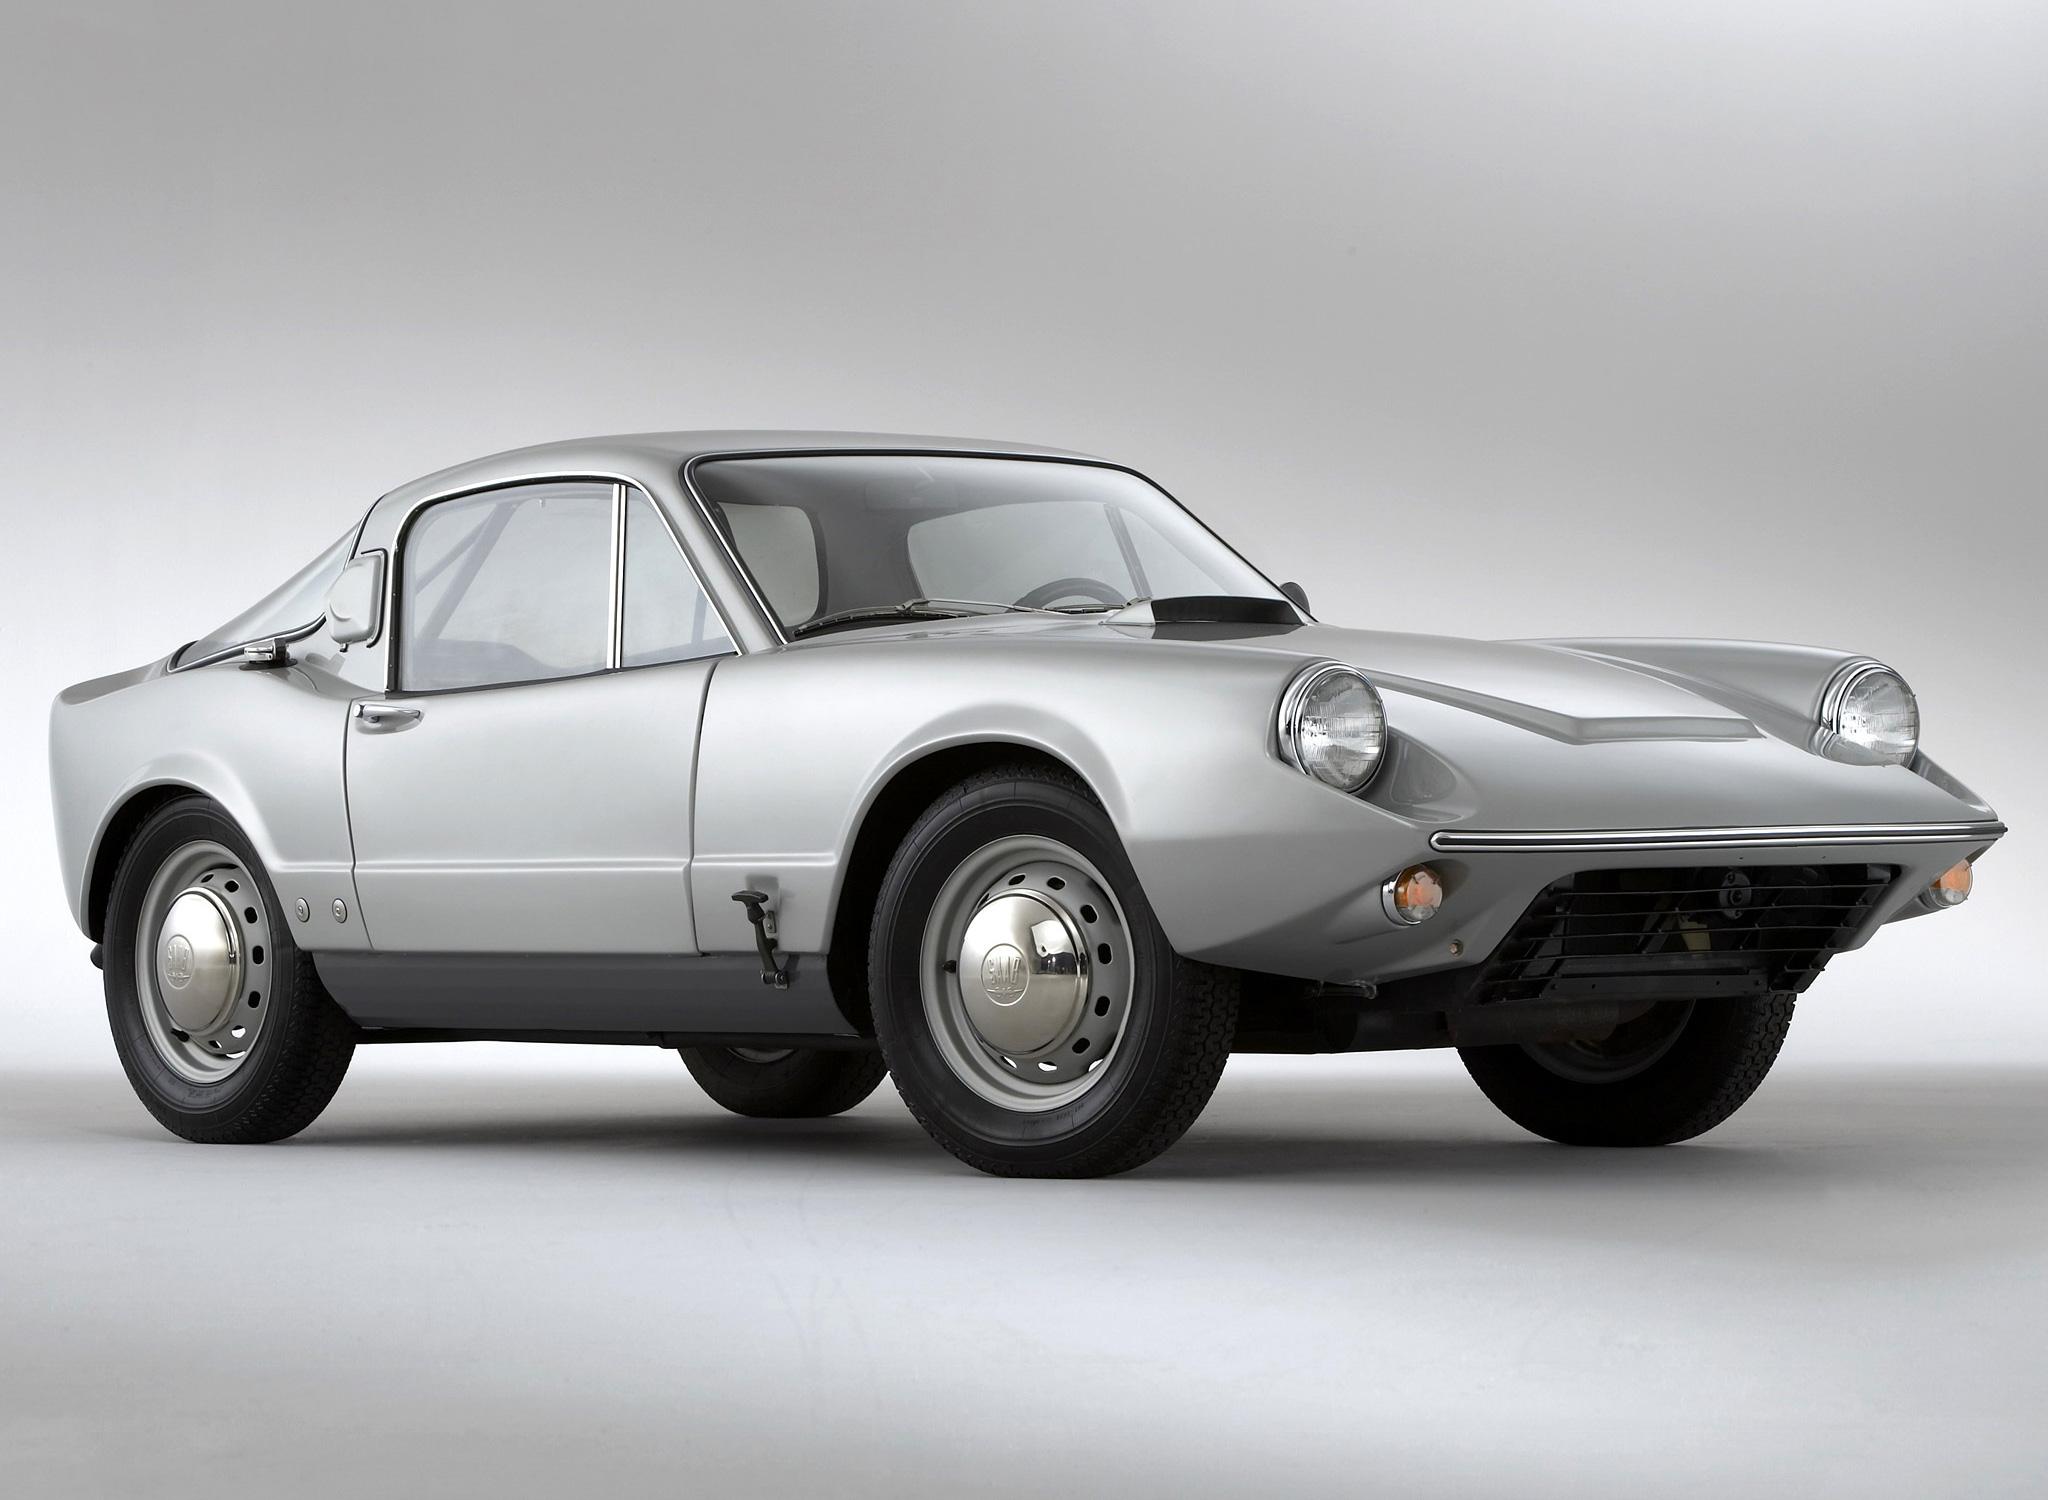 1966 Saab Sonett II front 3/4